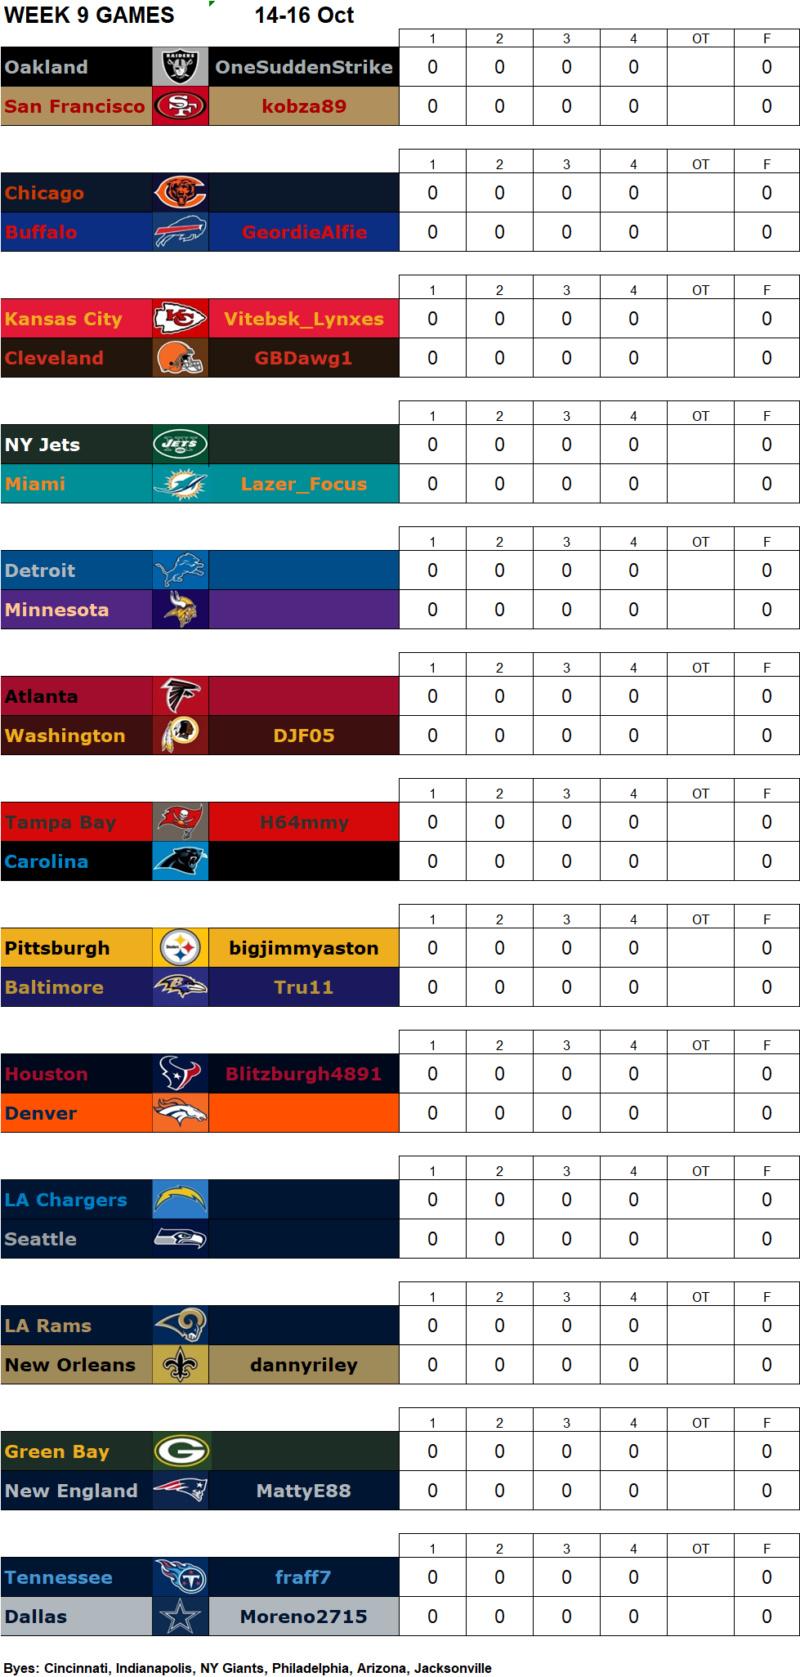 Week 9 Matchups, 14-16 October W9g11